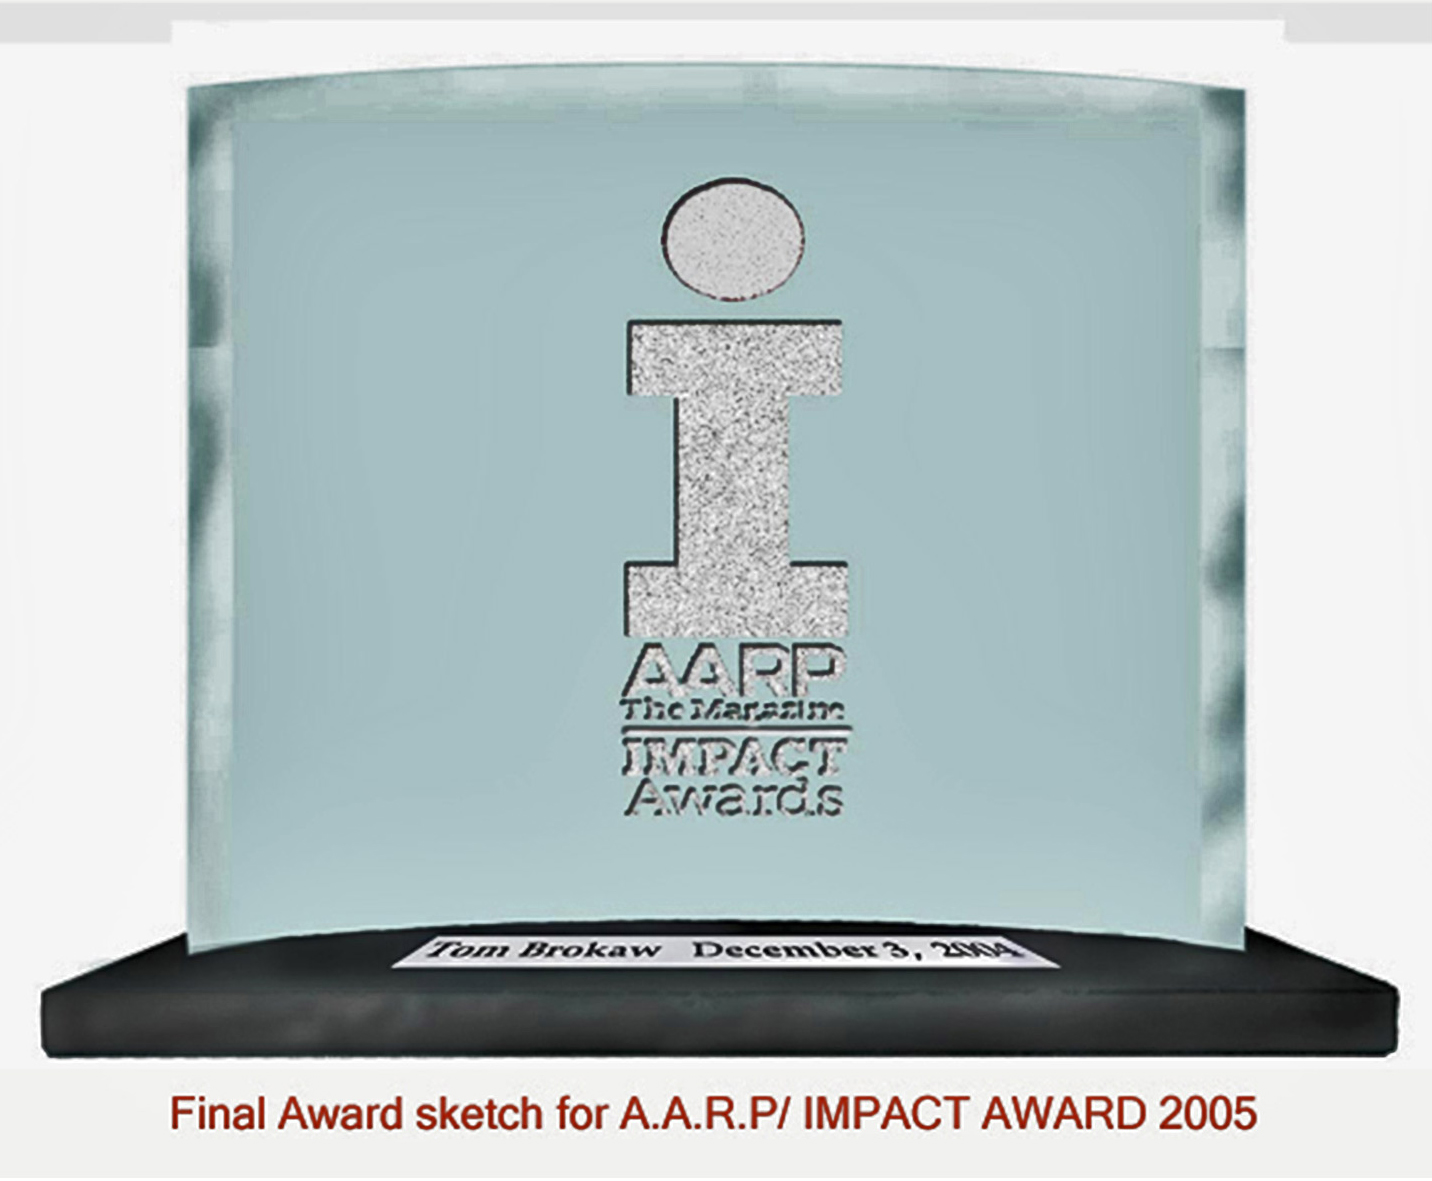 Douglas Randall AARP award in glass